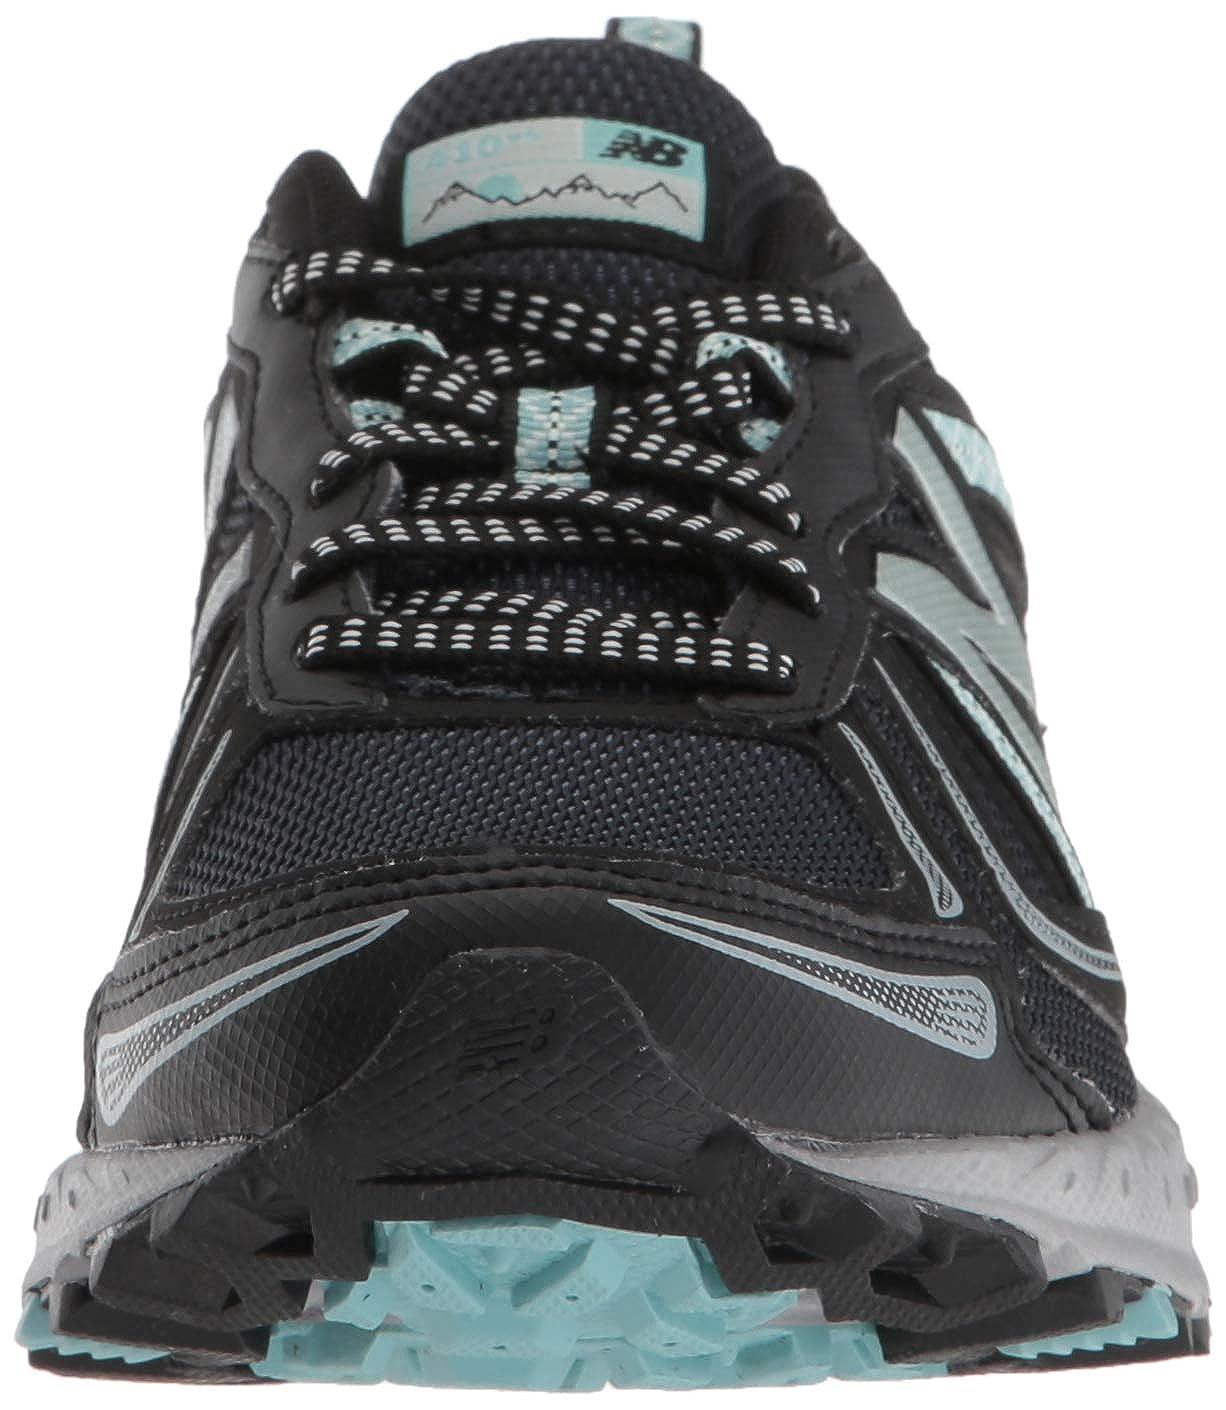 New Balance Women s 410v5 Cushioning Trail Running Shoe Black Thunder Ocean air 8 D US